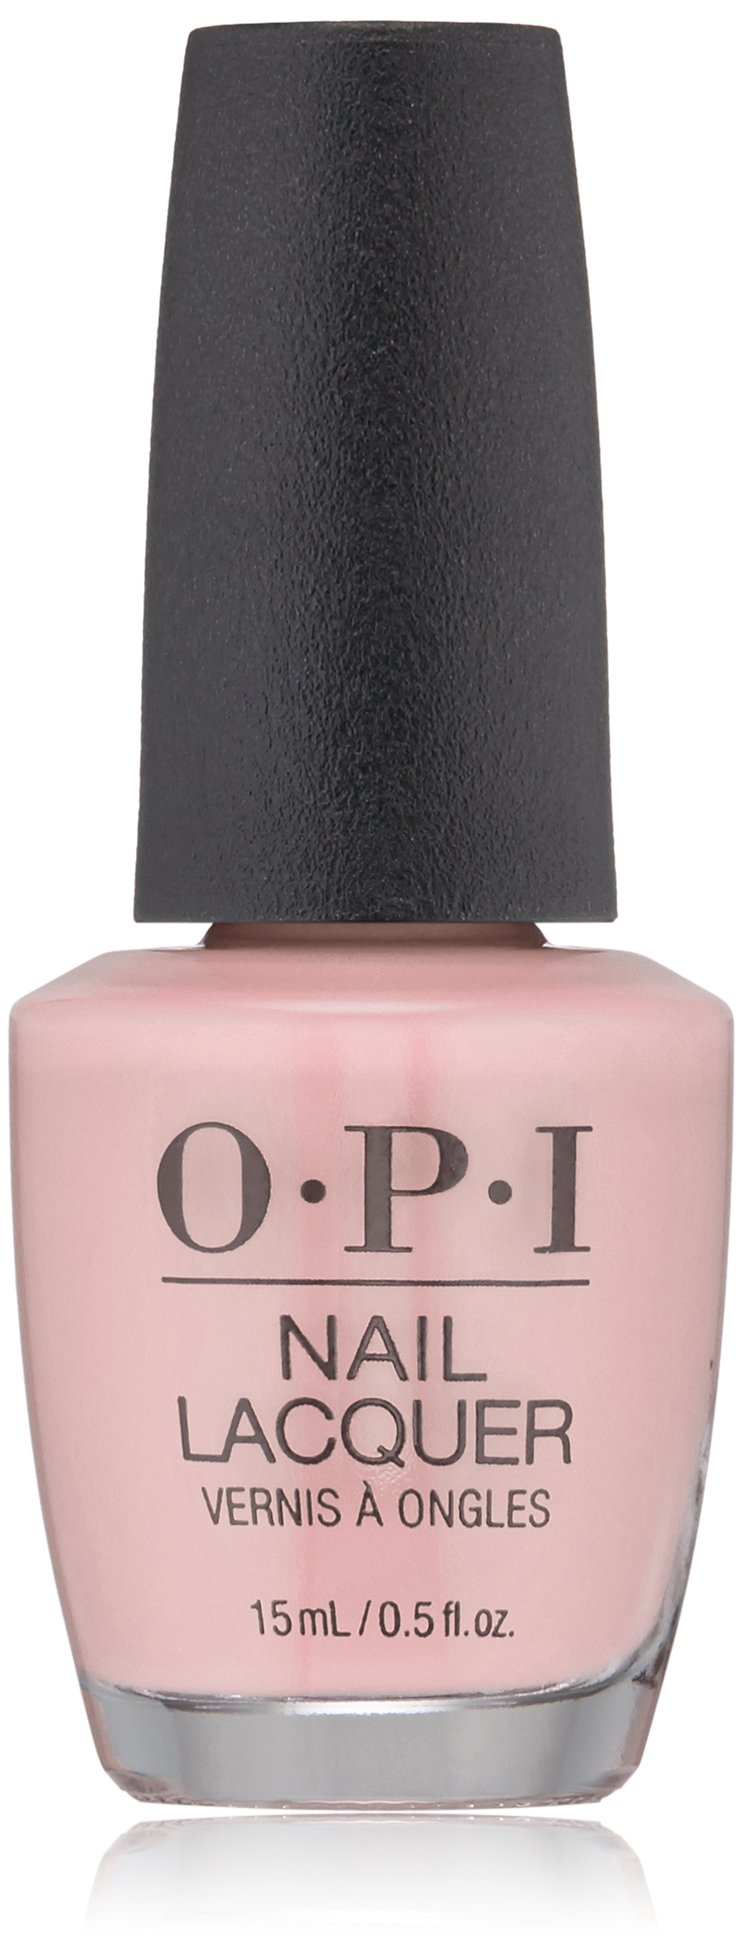 Amazon.com: OPI Nail Lacquer, Aphrodite's Pink Nightie, 0